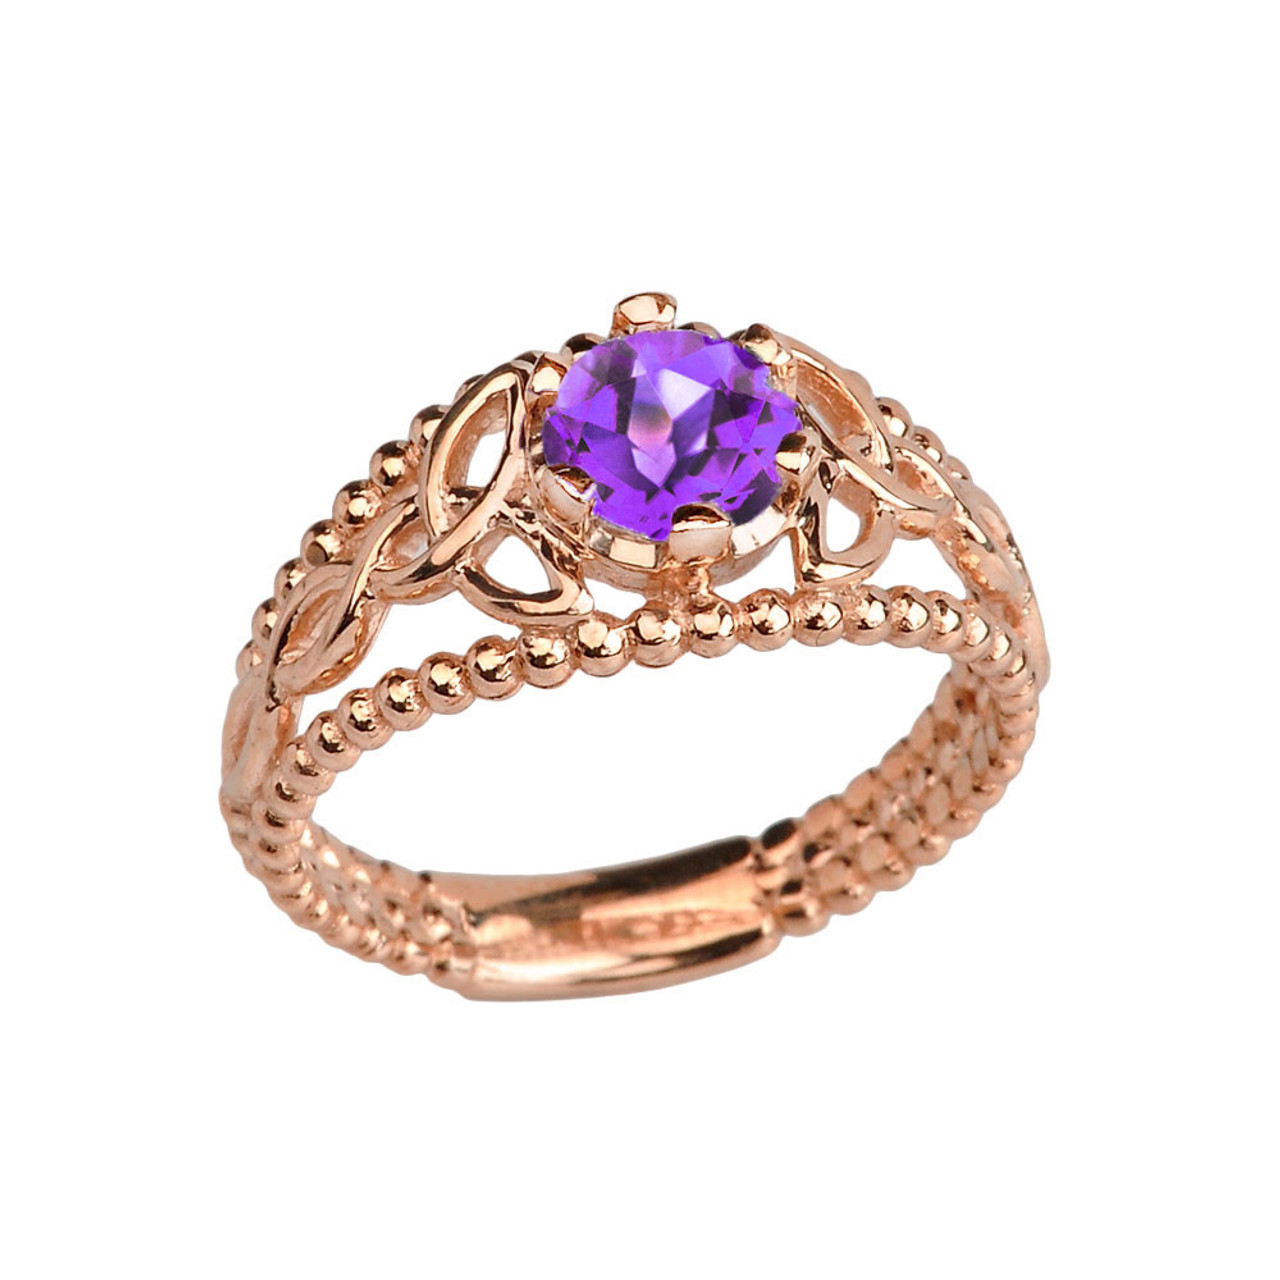 rose gold genuine amethyst beaded celtic trinity knot engagement promise ring. Black Bedroom Furniture Sets. Home Design Ideas